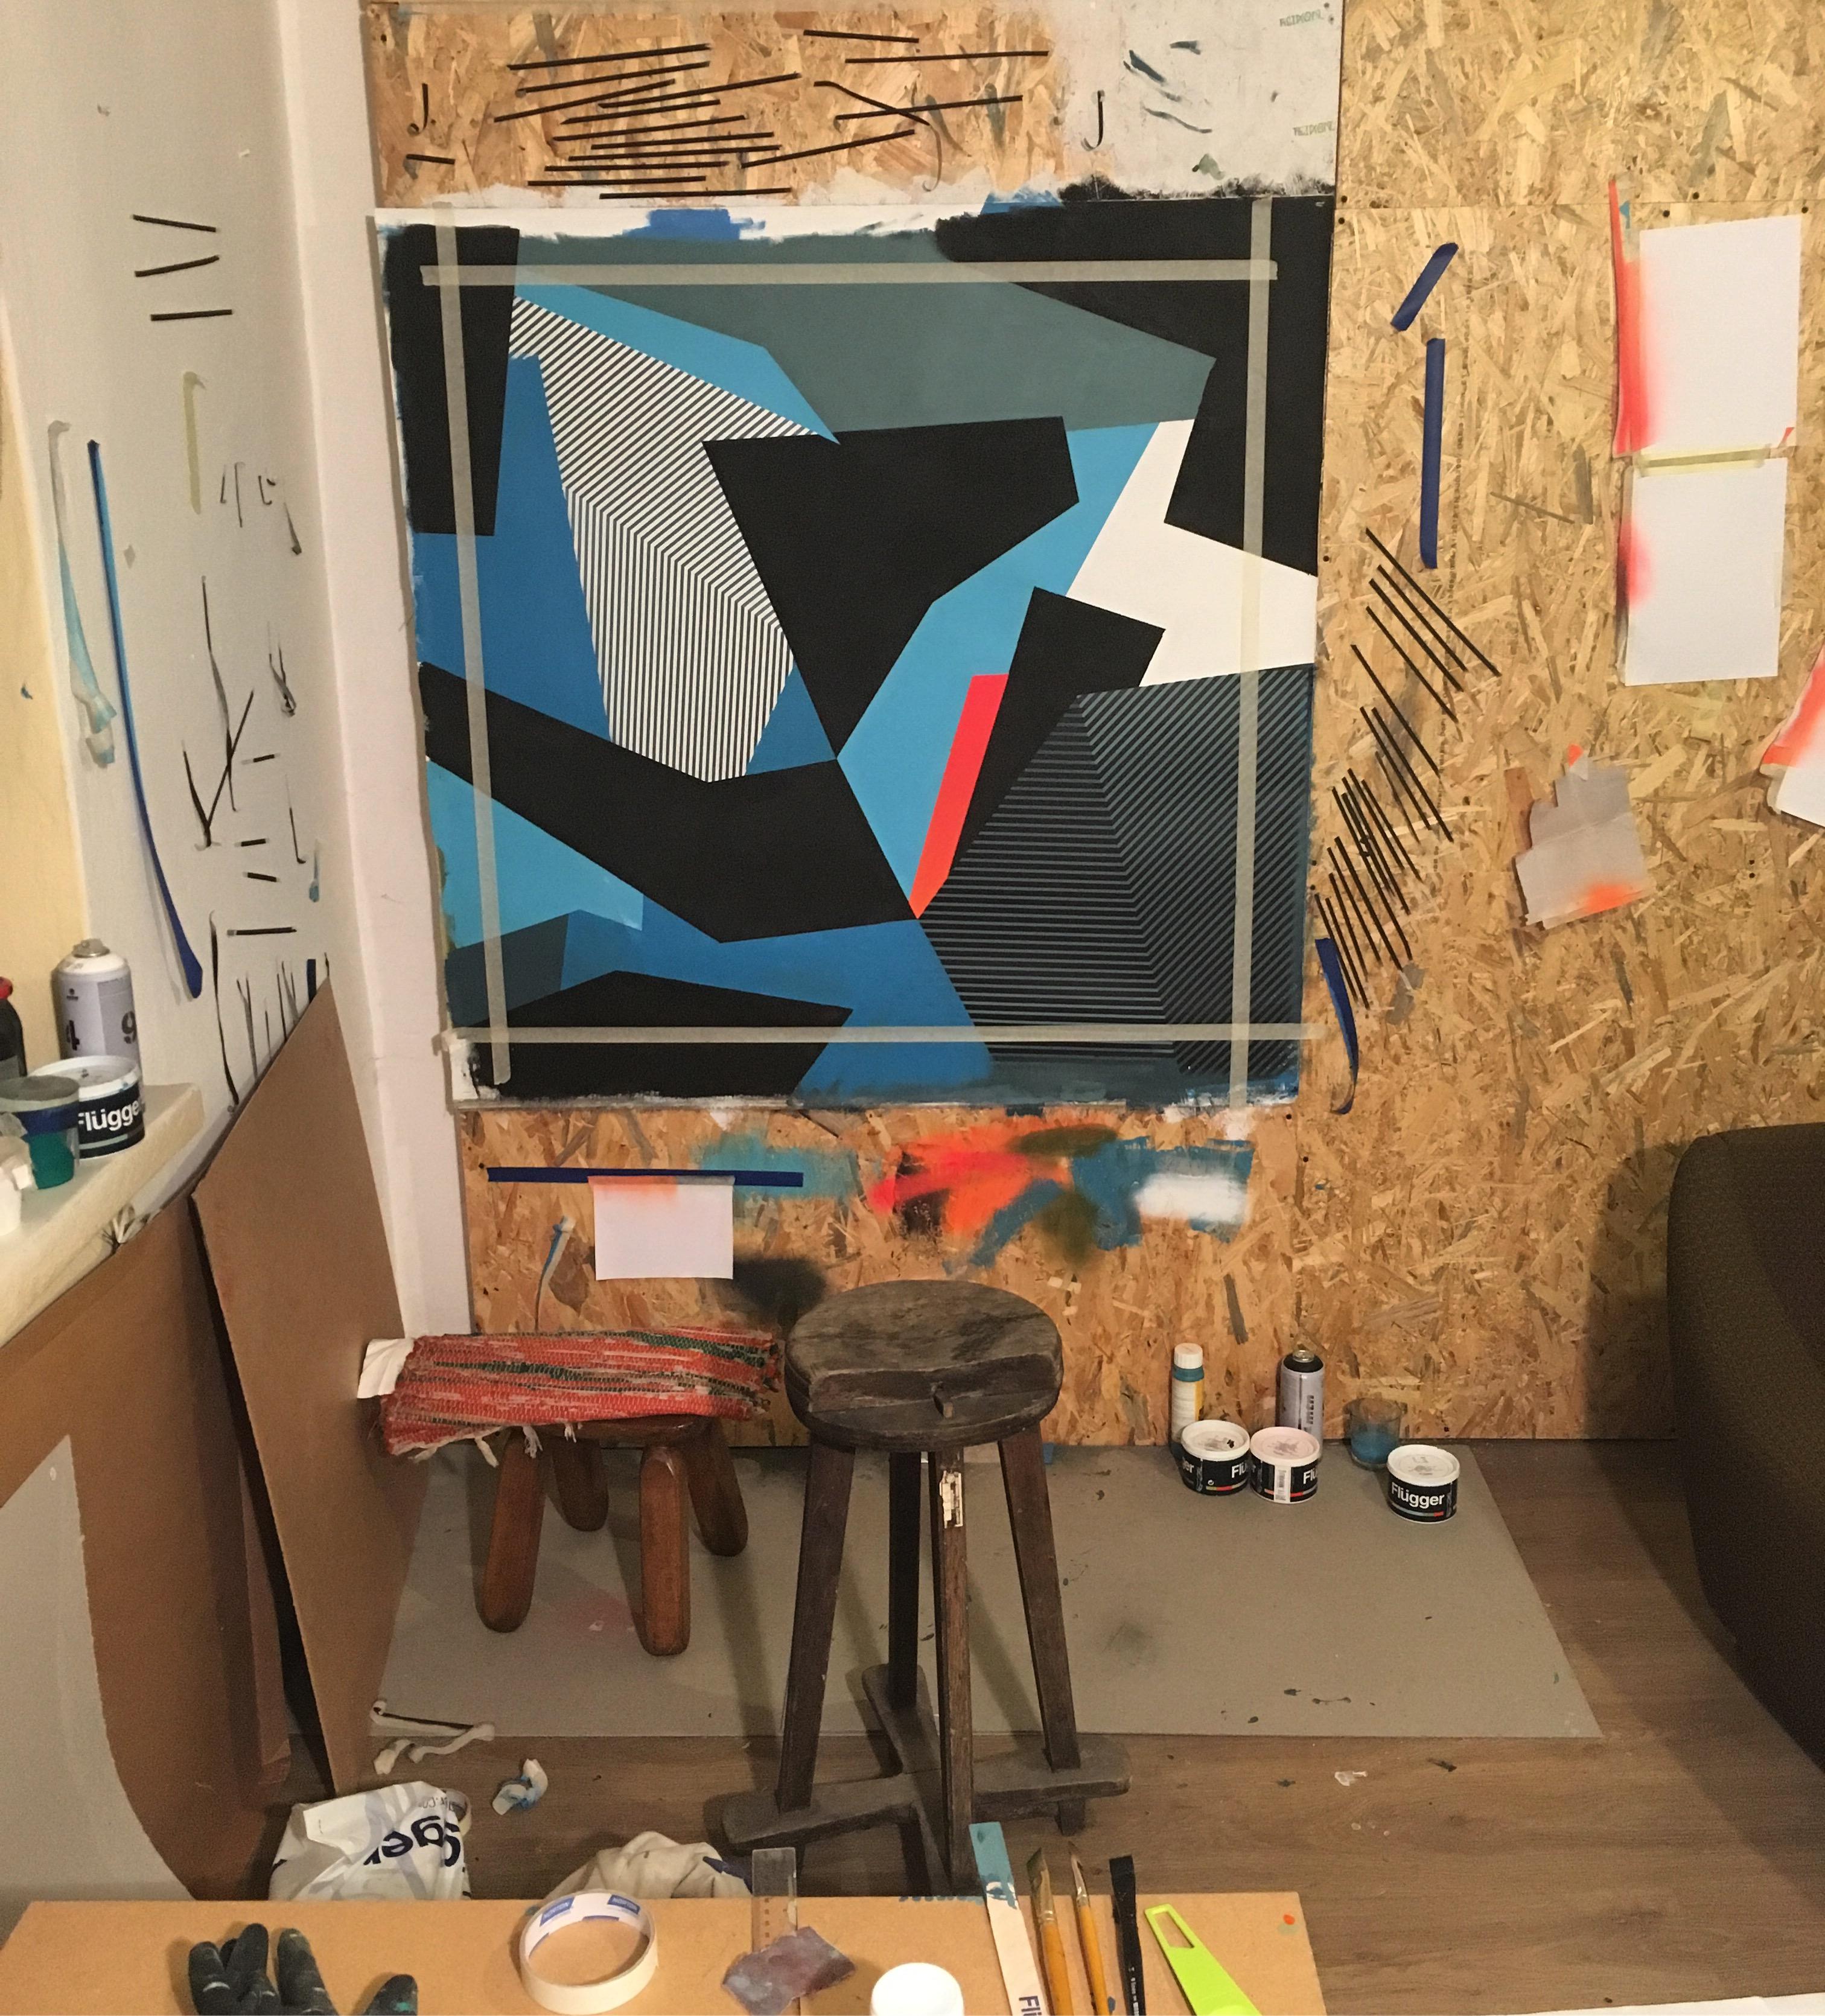 robert-seikon-mural-graffiti-geometrico- (11)